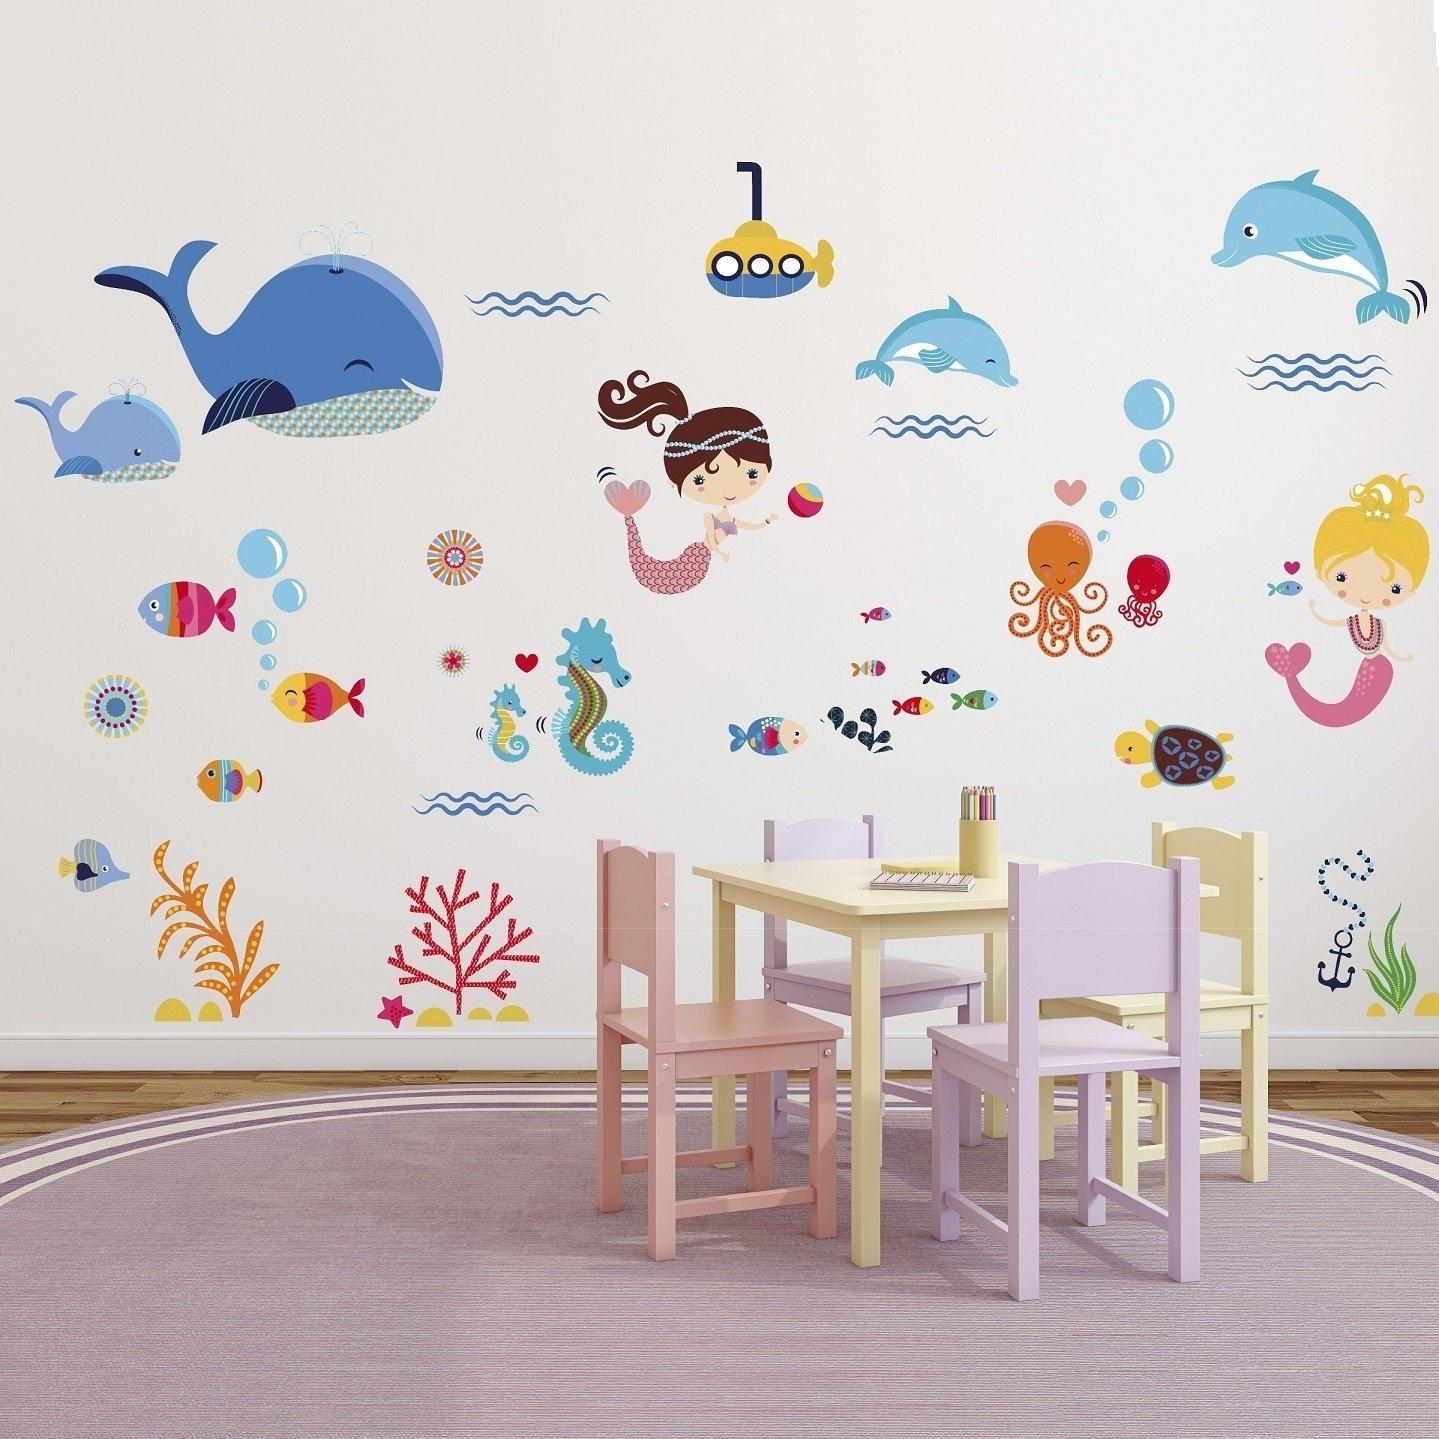 Mermaids Decorative Peel & Stick Wall Art Sticker Decals For Kids regarding Stick on Wall Art (Image 7 of 20)